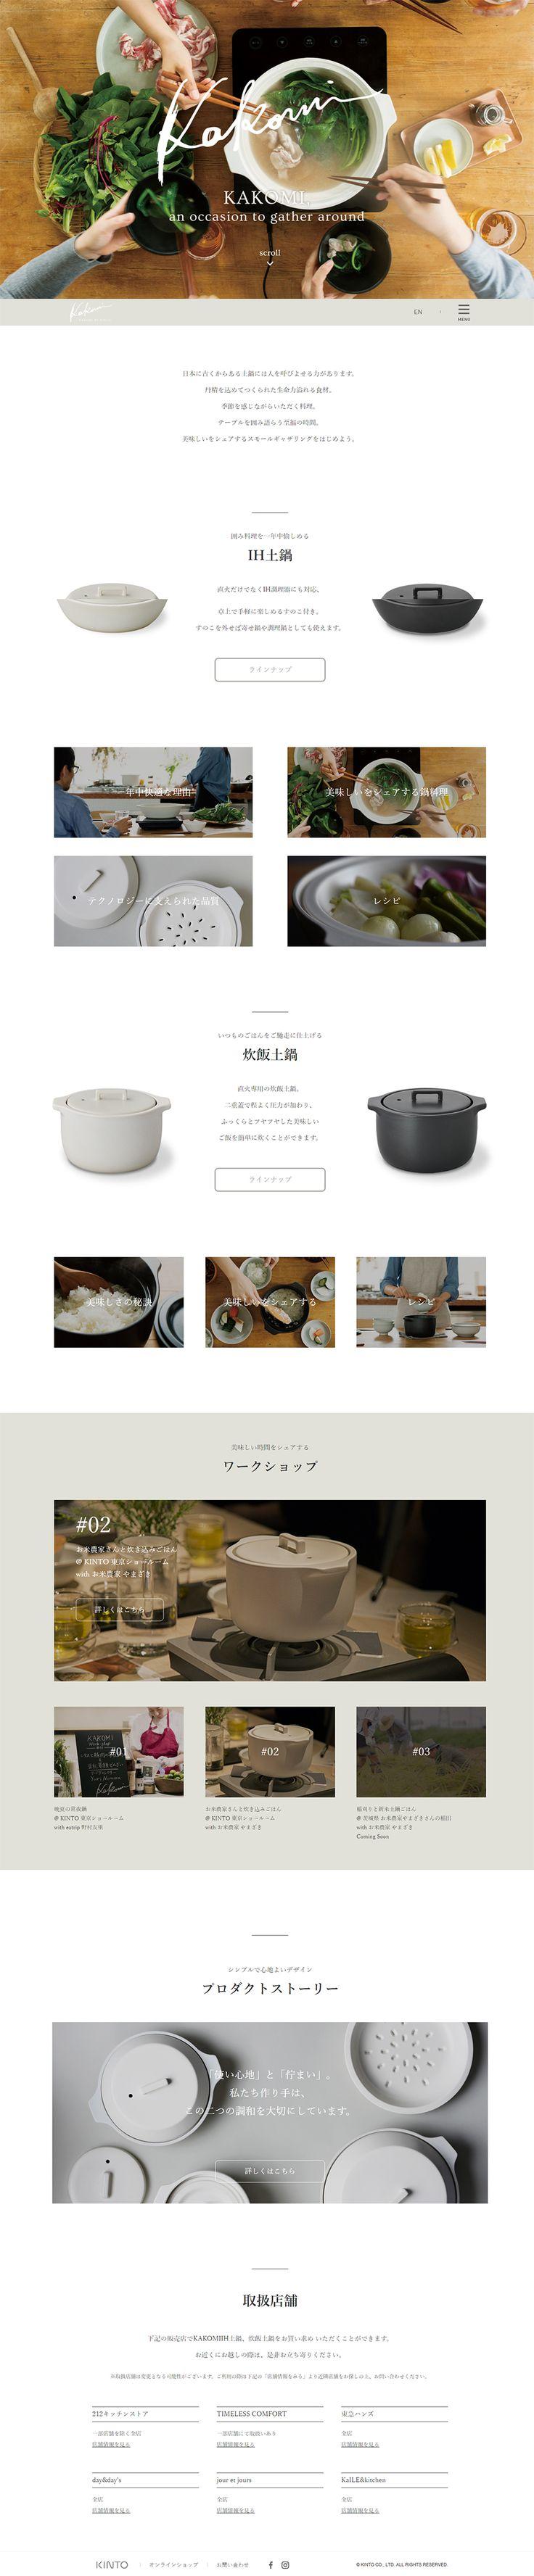 KAKOMI KINTO【日用雑貨関連】のLPデザイン。WEBデザイナーさん必見!ランディングページのデザイン参考に(シンプル系)